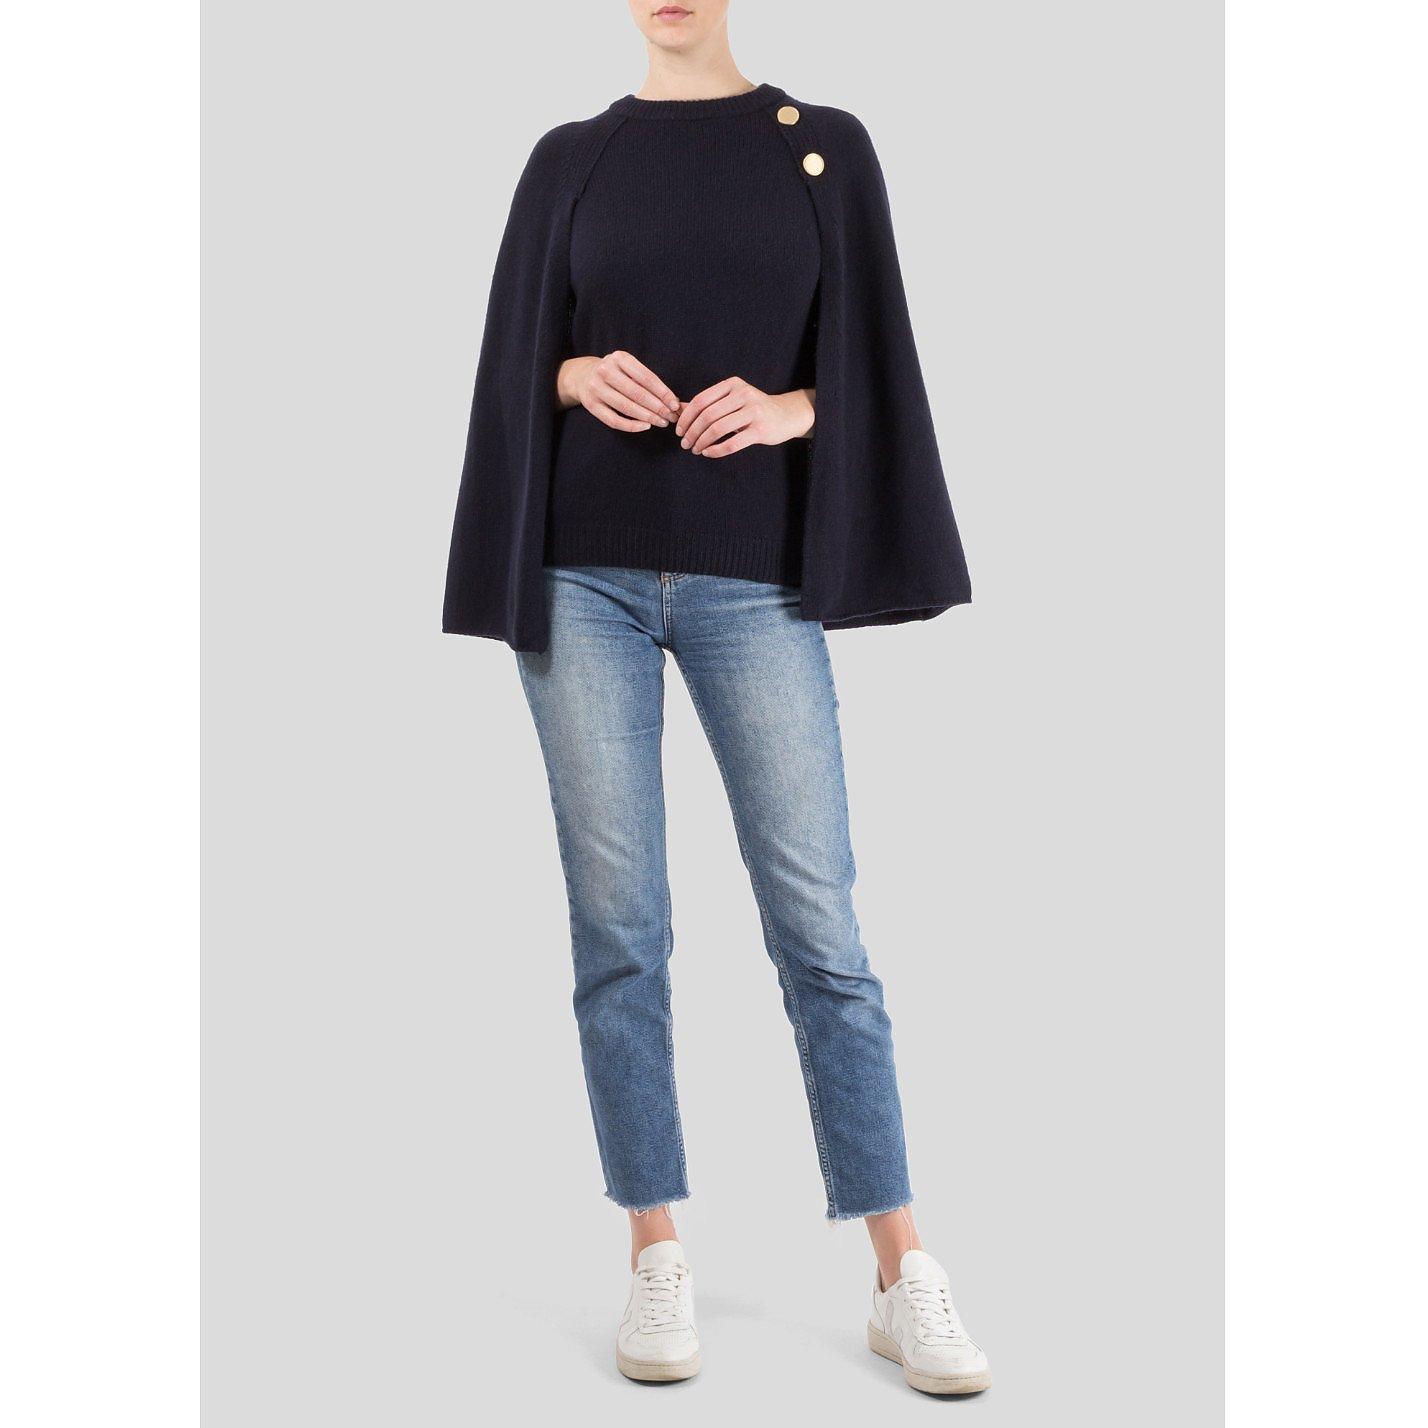 Vanessa Bruno Poncho Style Sweater